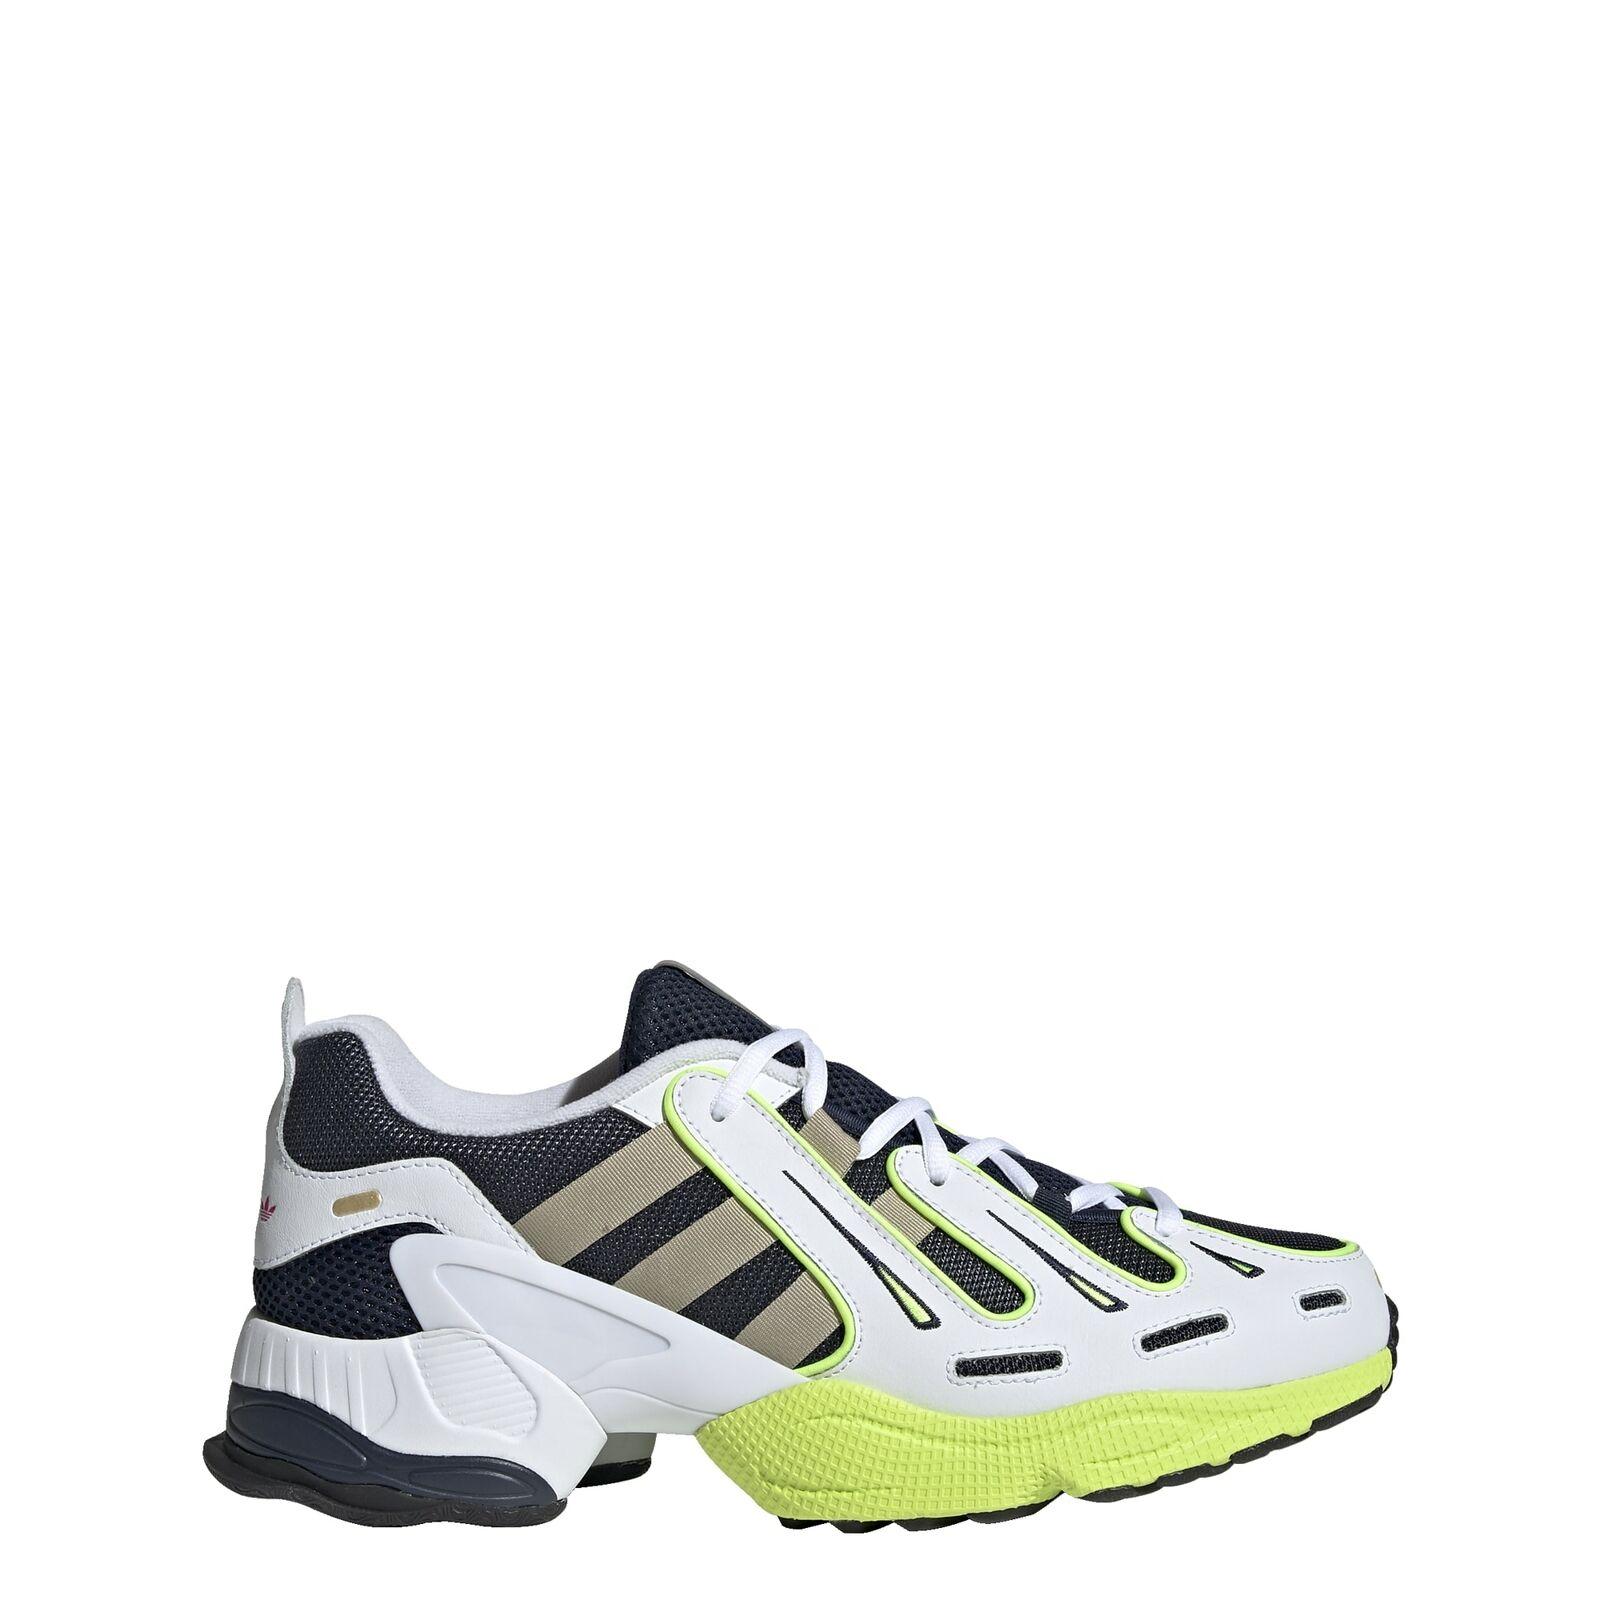 Adidas Originals EQT Gazelle Schuh Herren Trainers;Lifestyle Trainers Blau